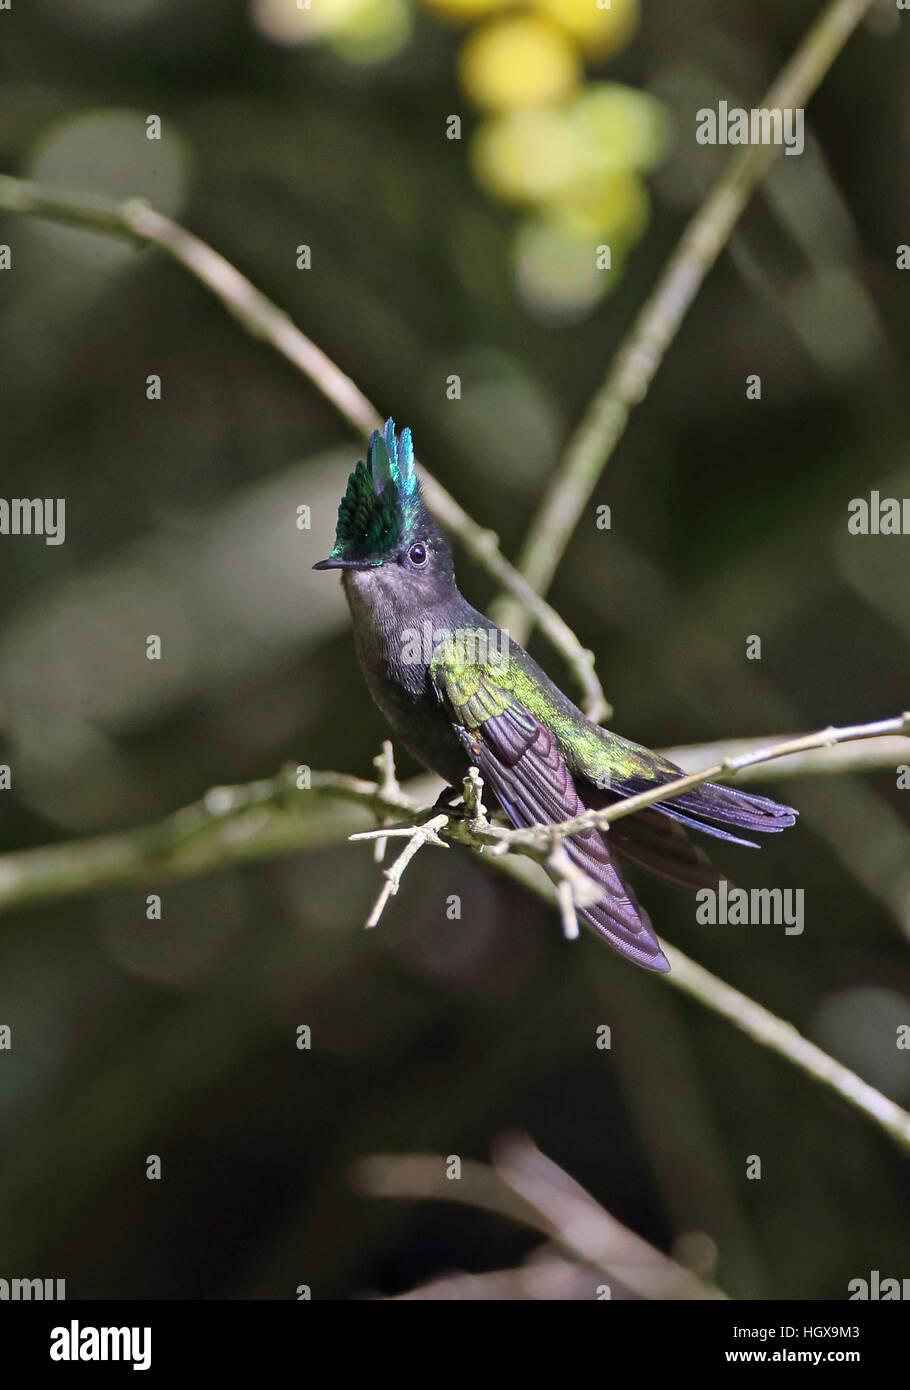 Antillean Crested Hummingbird (Orthorhyncus cristatus exilis) adult male  Fond Doux plantation, St Lucia, Lesser - Stock Image